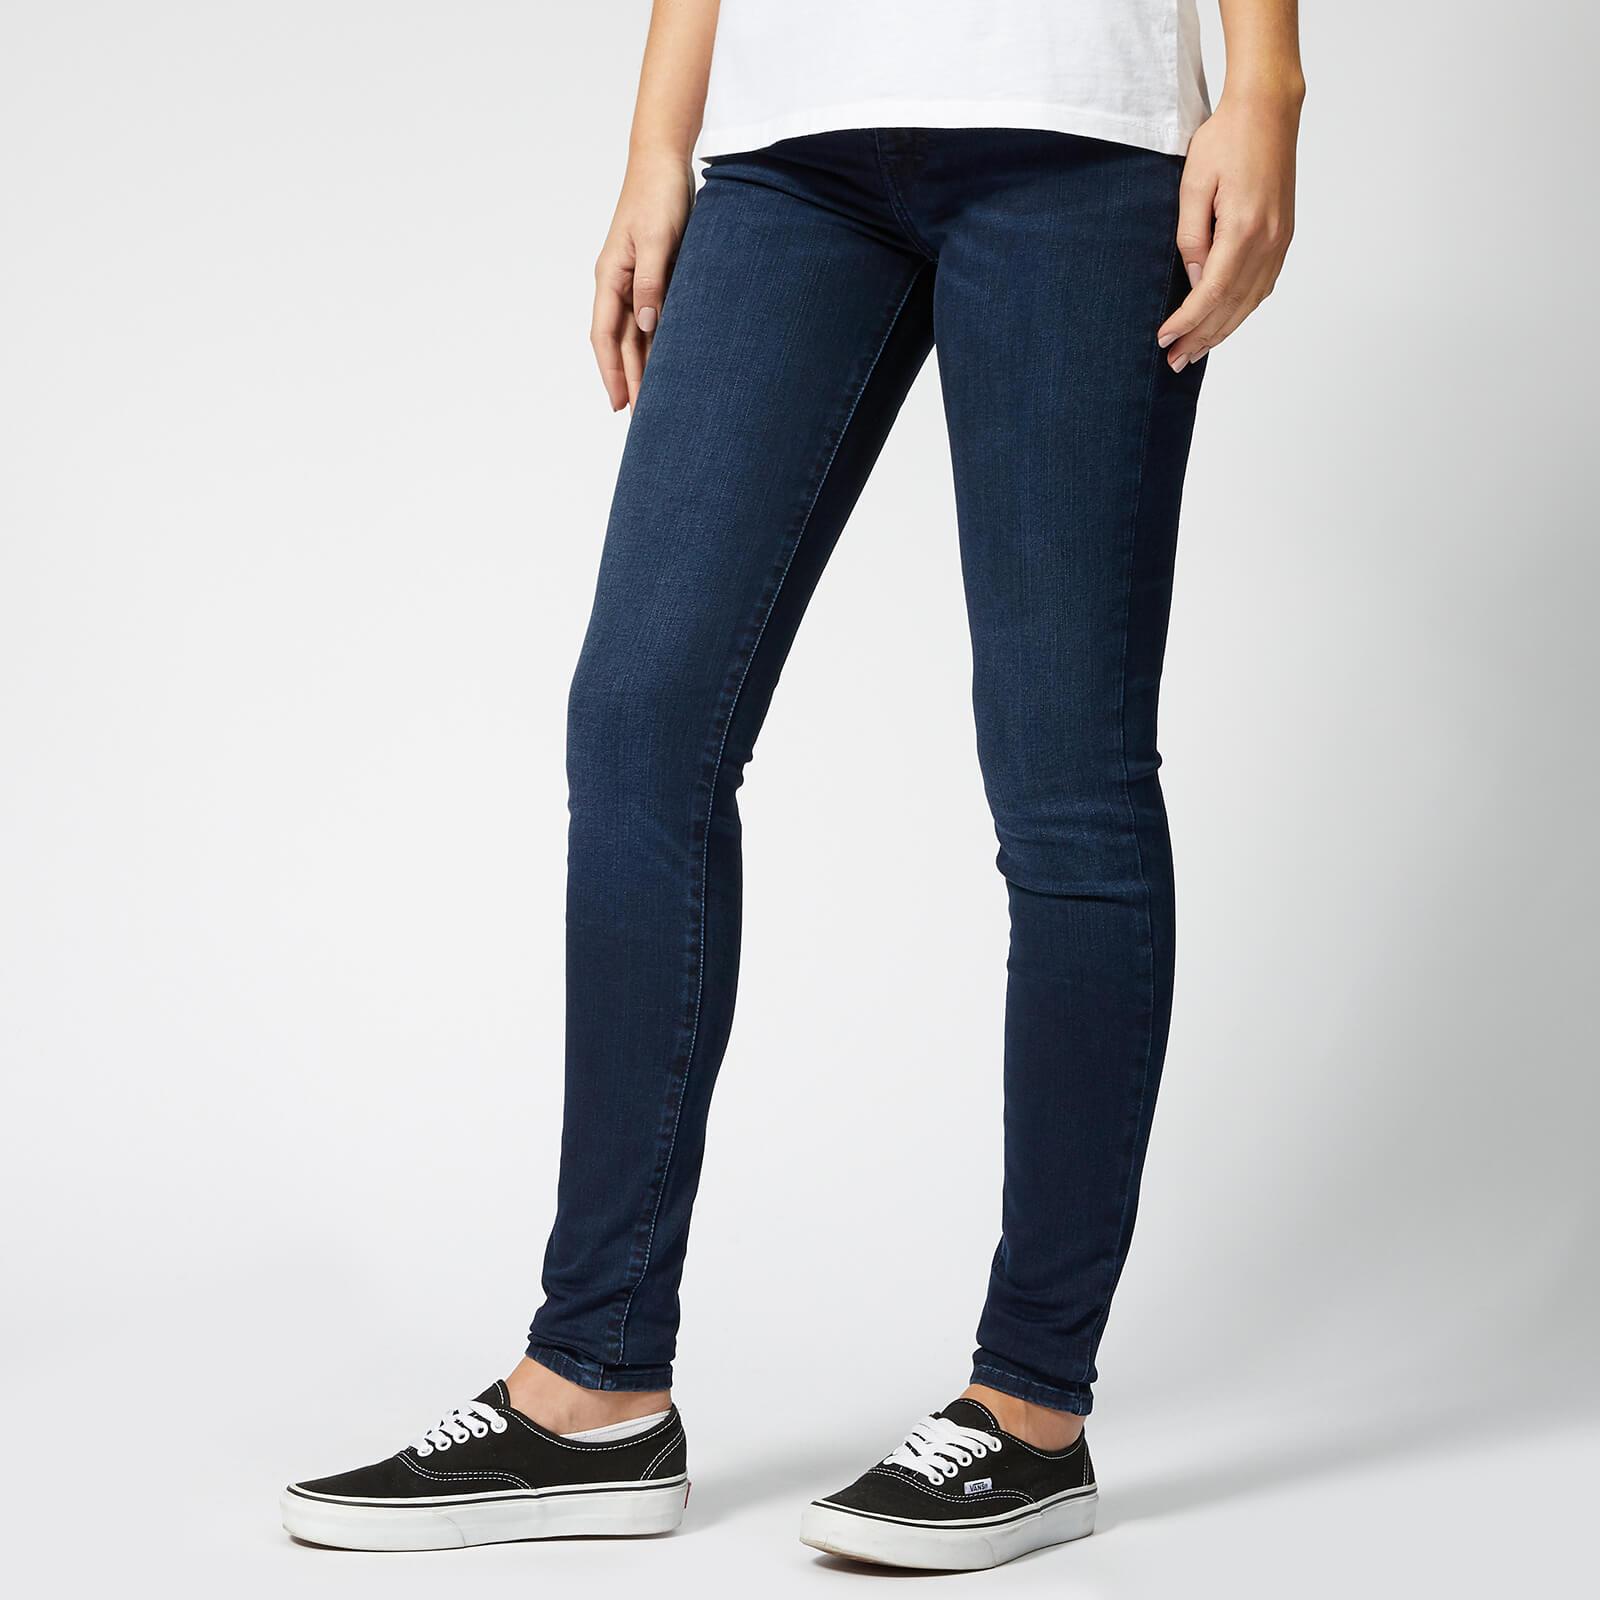 5de006ad Levi's Women's Mile High Super Skinny Jeans - Make a Mark Clothing |  TheHut.com